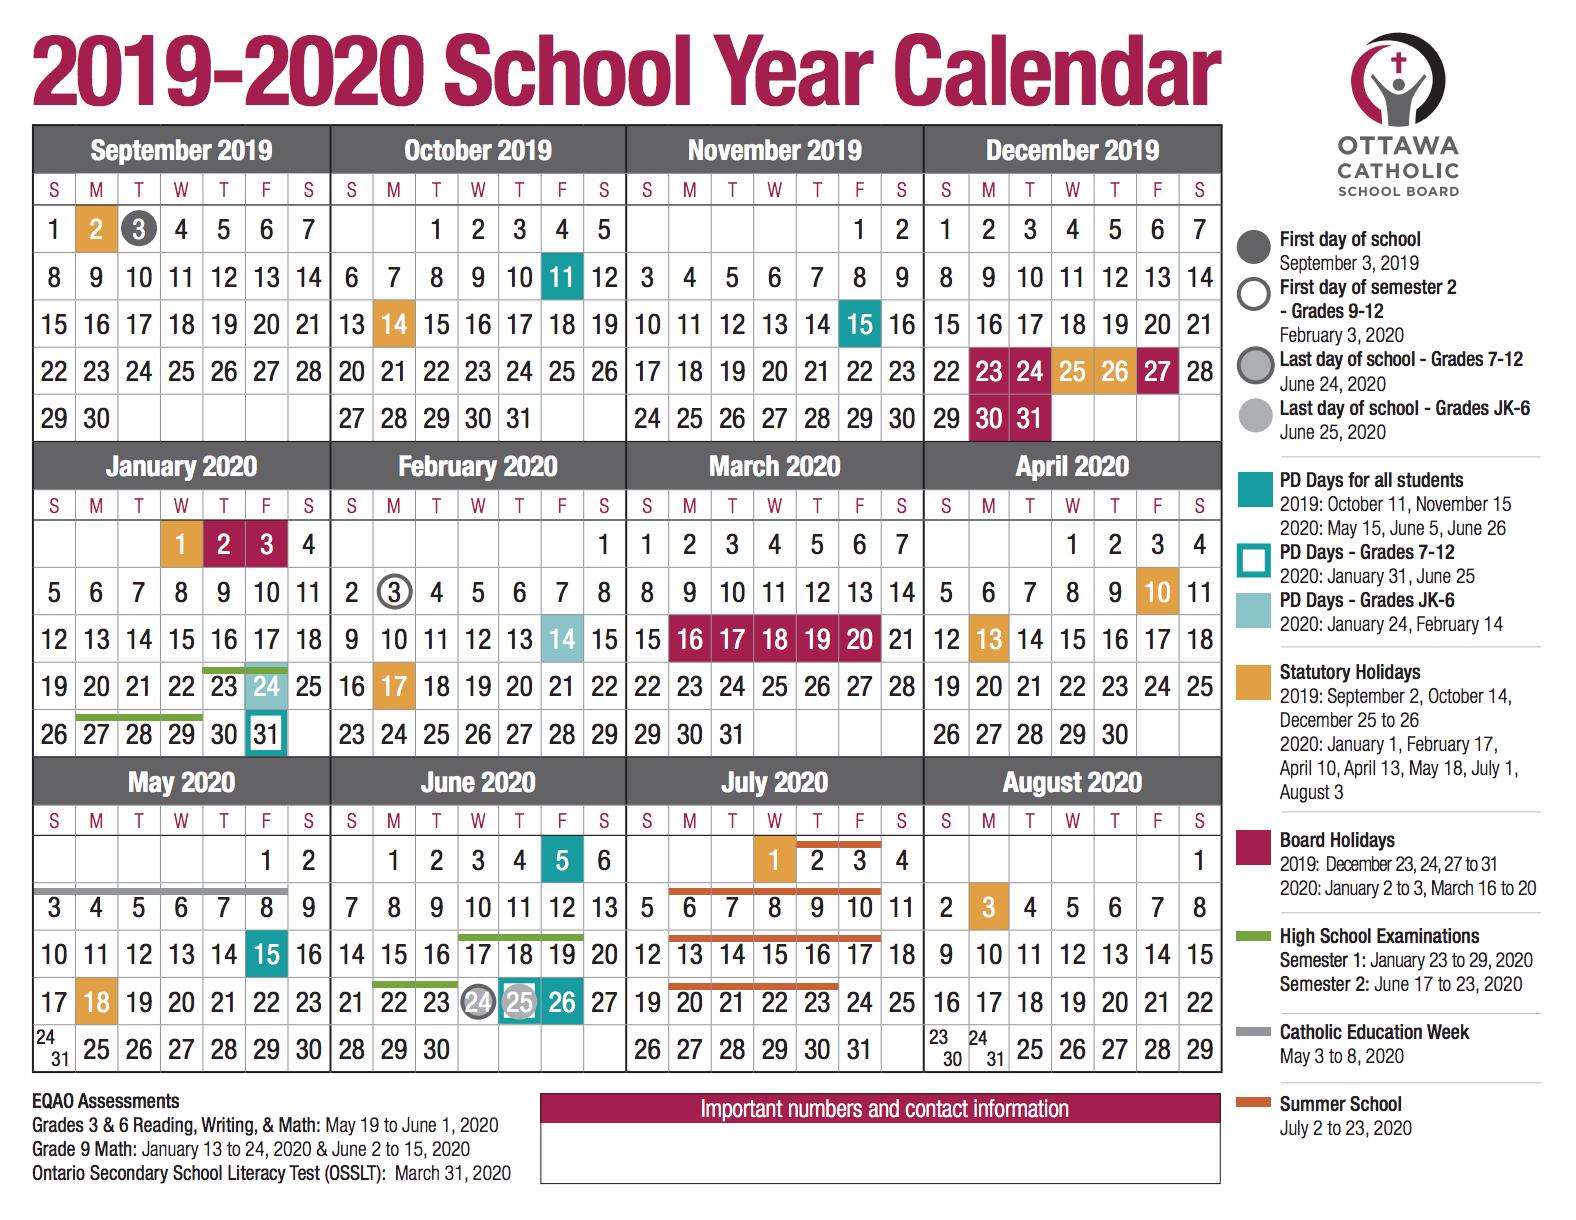 School Year Calendar From The Ocsb